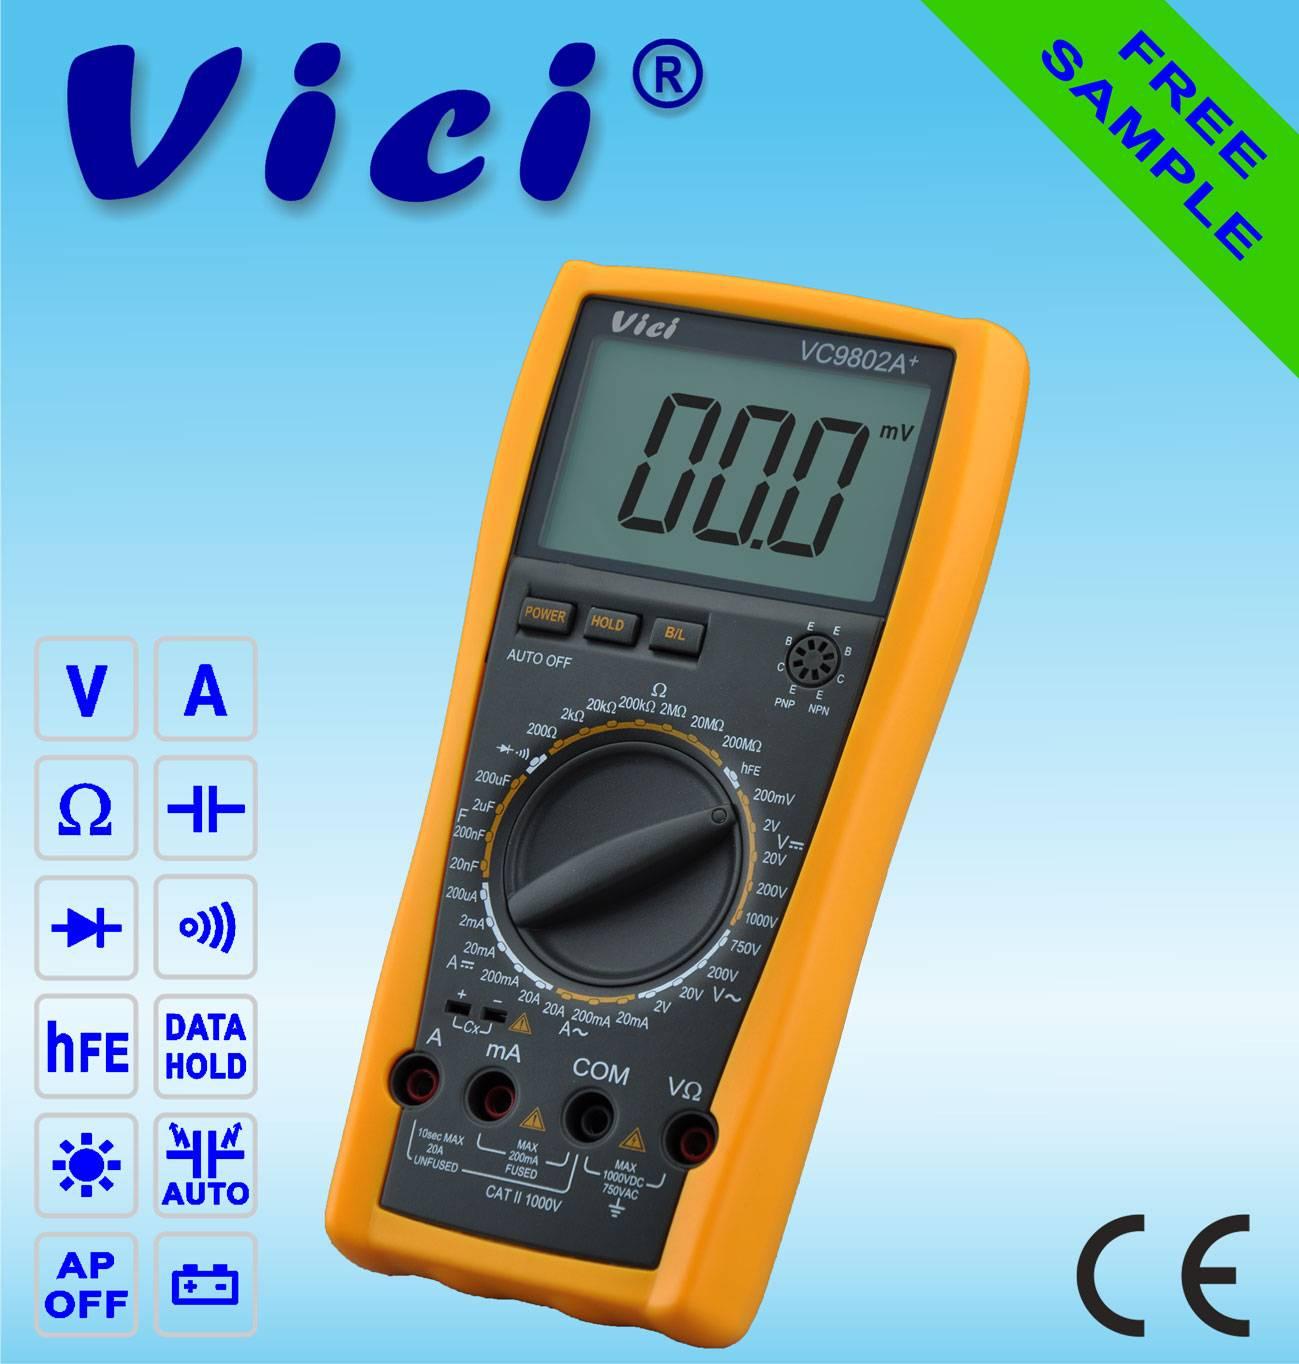 VC9802A+  3 1/2  Portable digital multimeter